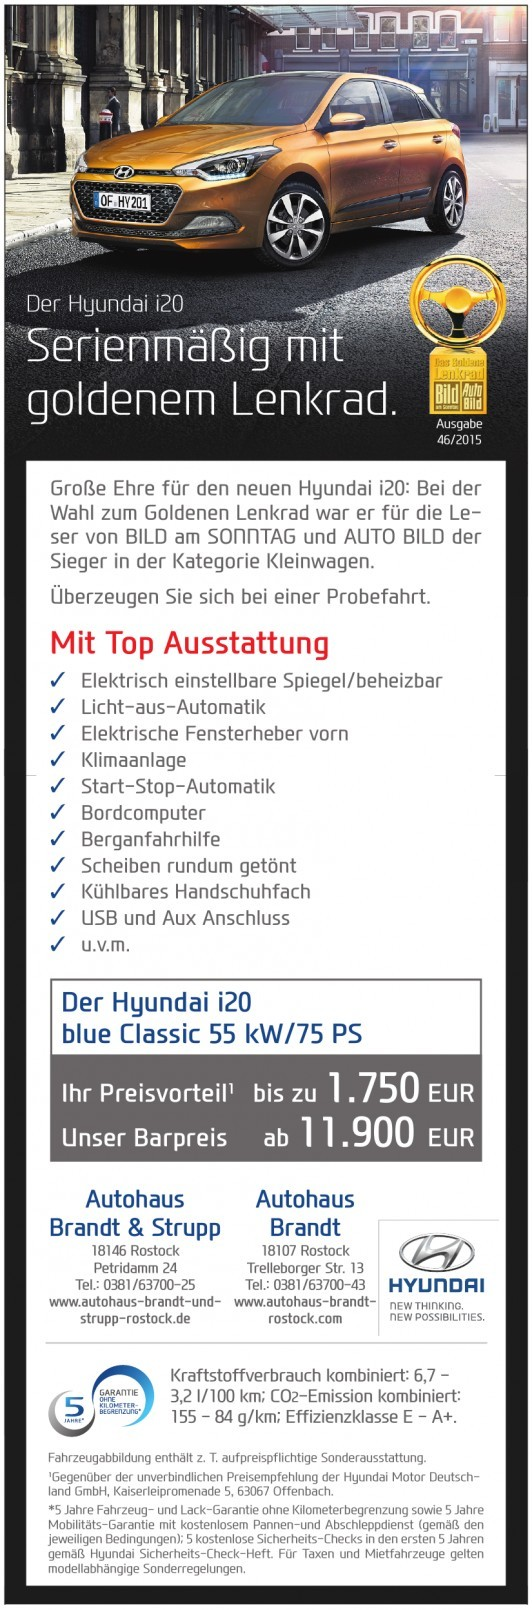 Autohaus Brandt & Strupp